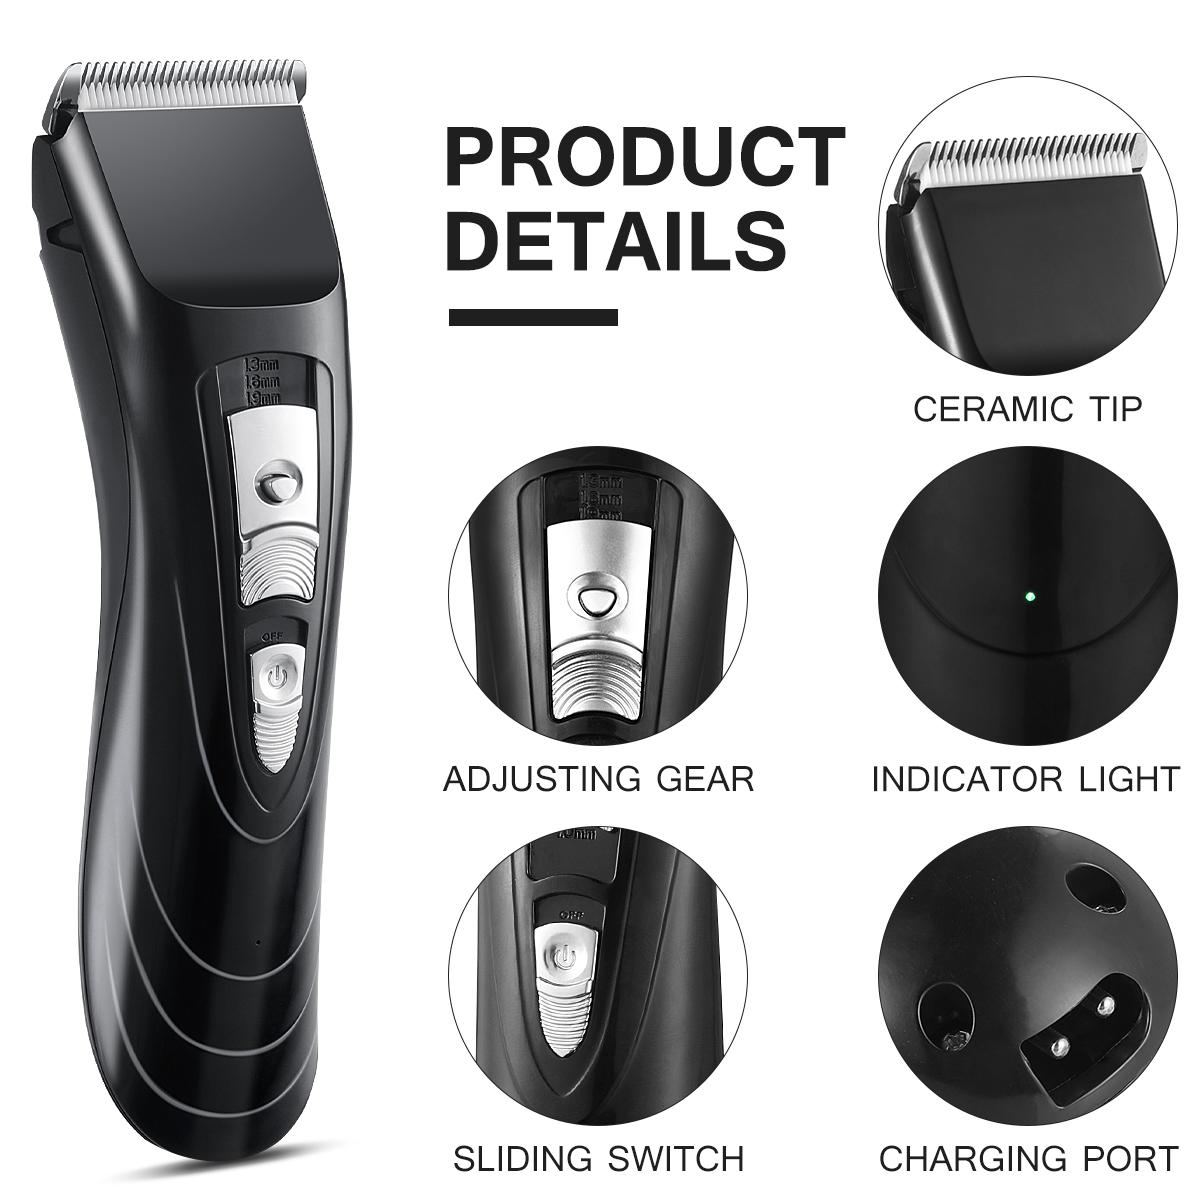 Cordless Hair Clippers for Men, Cordless Hair & Beard Trimmer Waterproof Kit